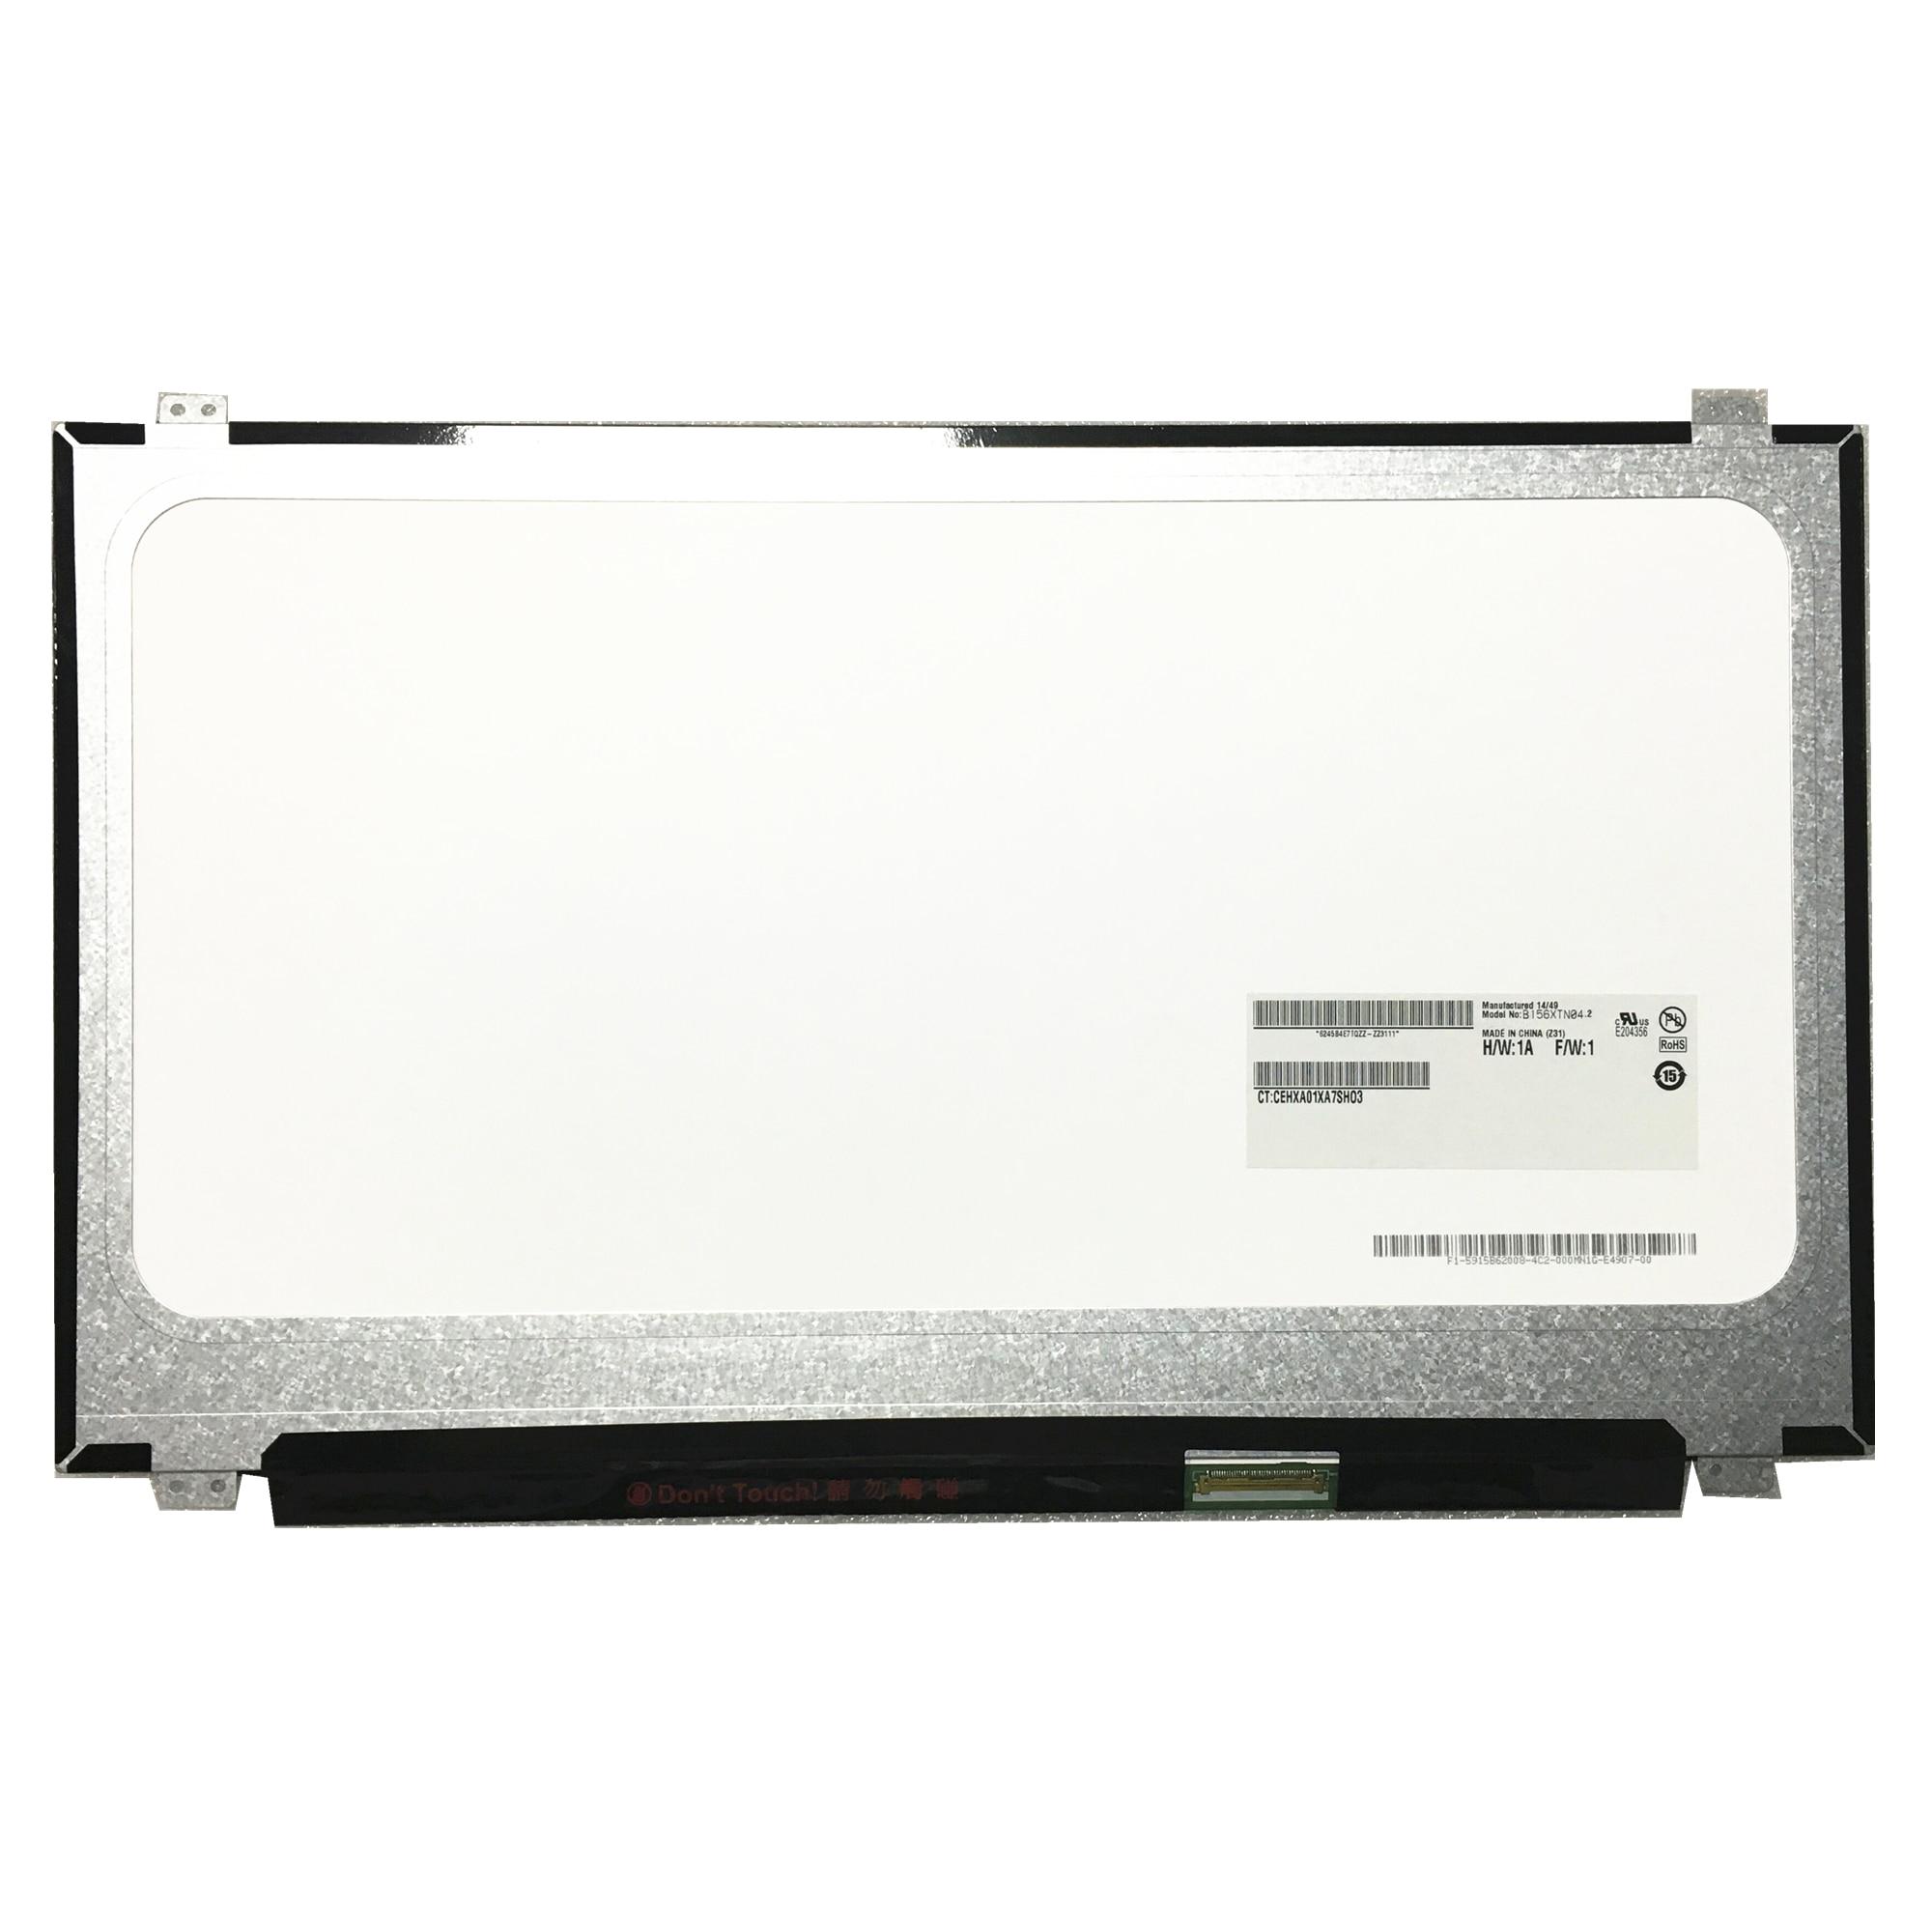 Envío Gratis, B156XTN04.2 B156XTN04.3 LP156WHB TLA1 lp156wb TLB1 TLC1 NT156WHM N10 N156BGE-L31, pantalla Lcd, 1366x768 LVDS, 40 pines